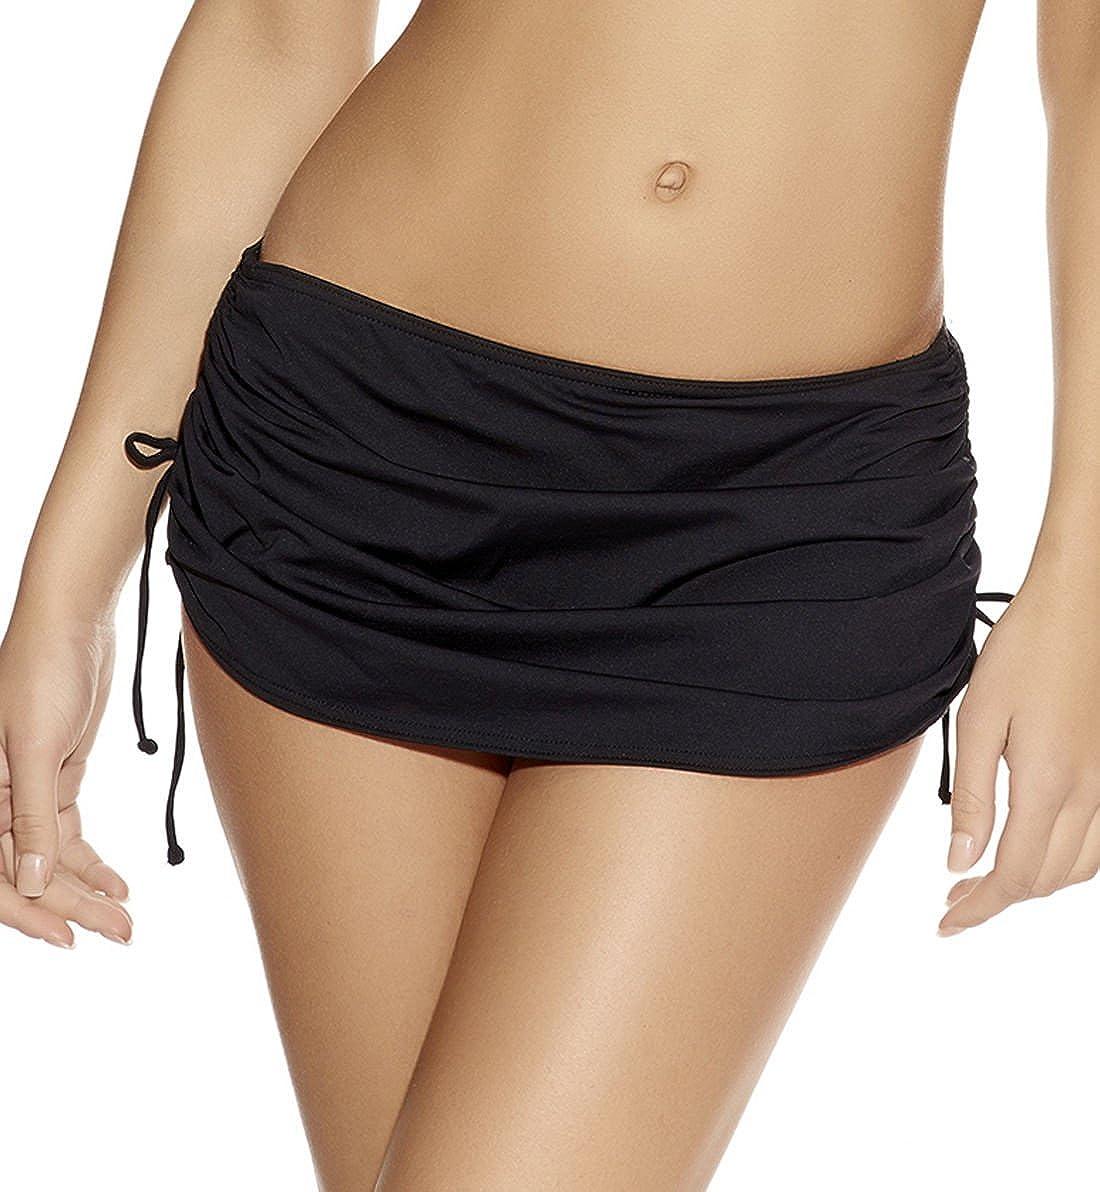 Crazycatz@Women Mix Skirted Bikini Brief Bottoms Plus Size Swim Skirt